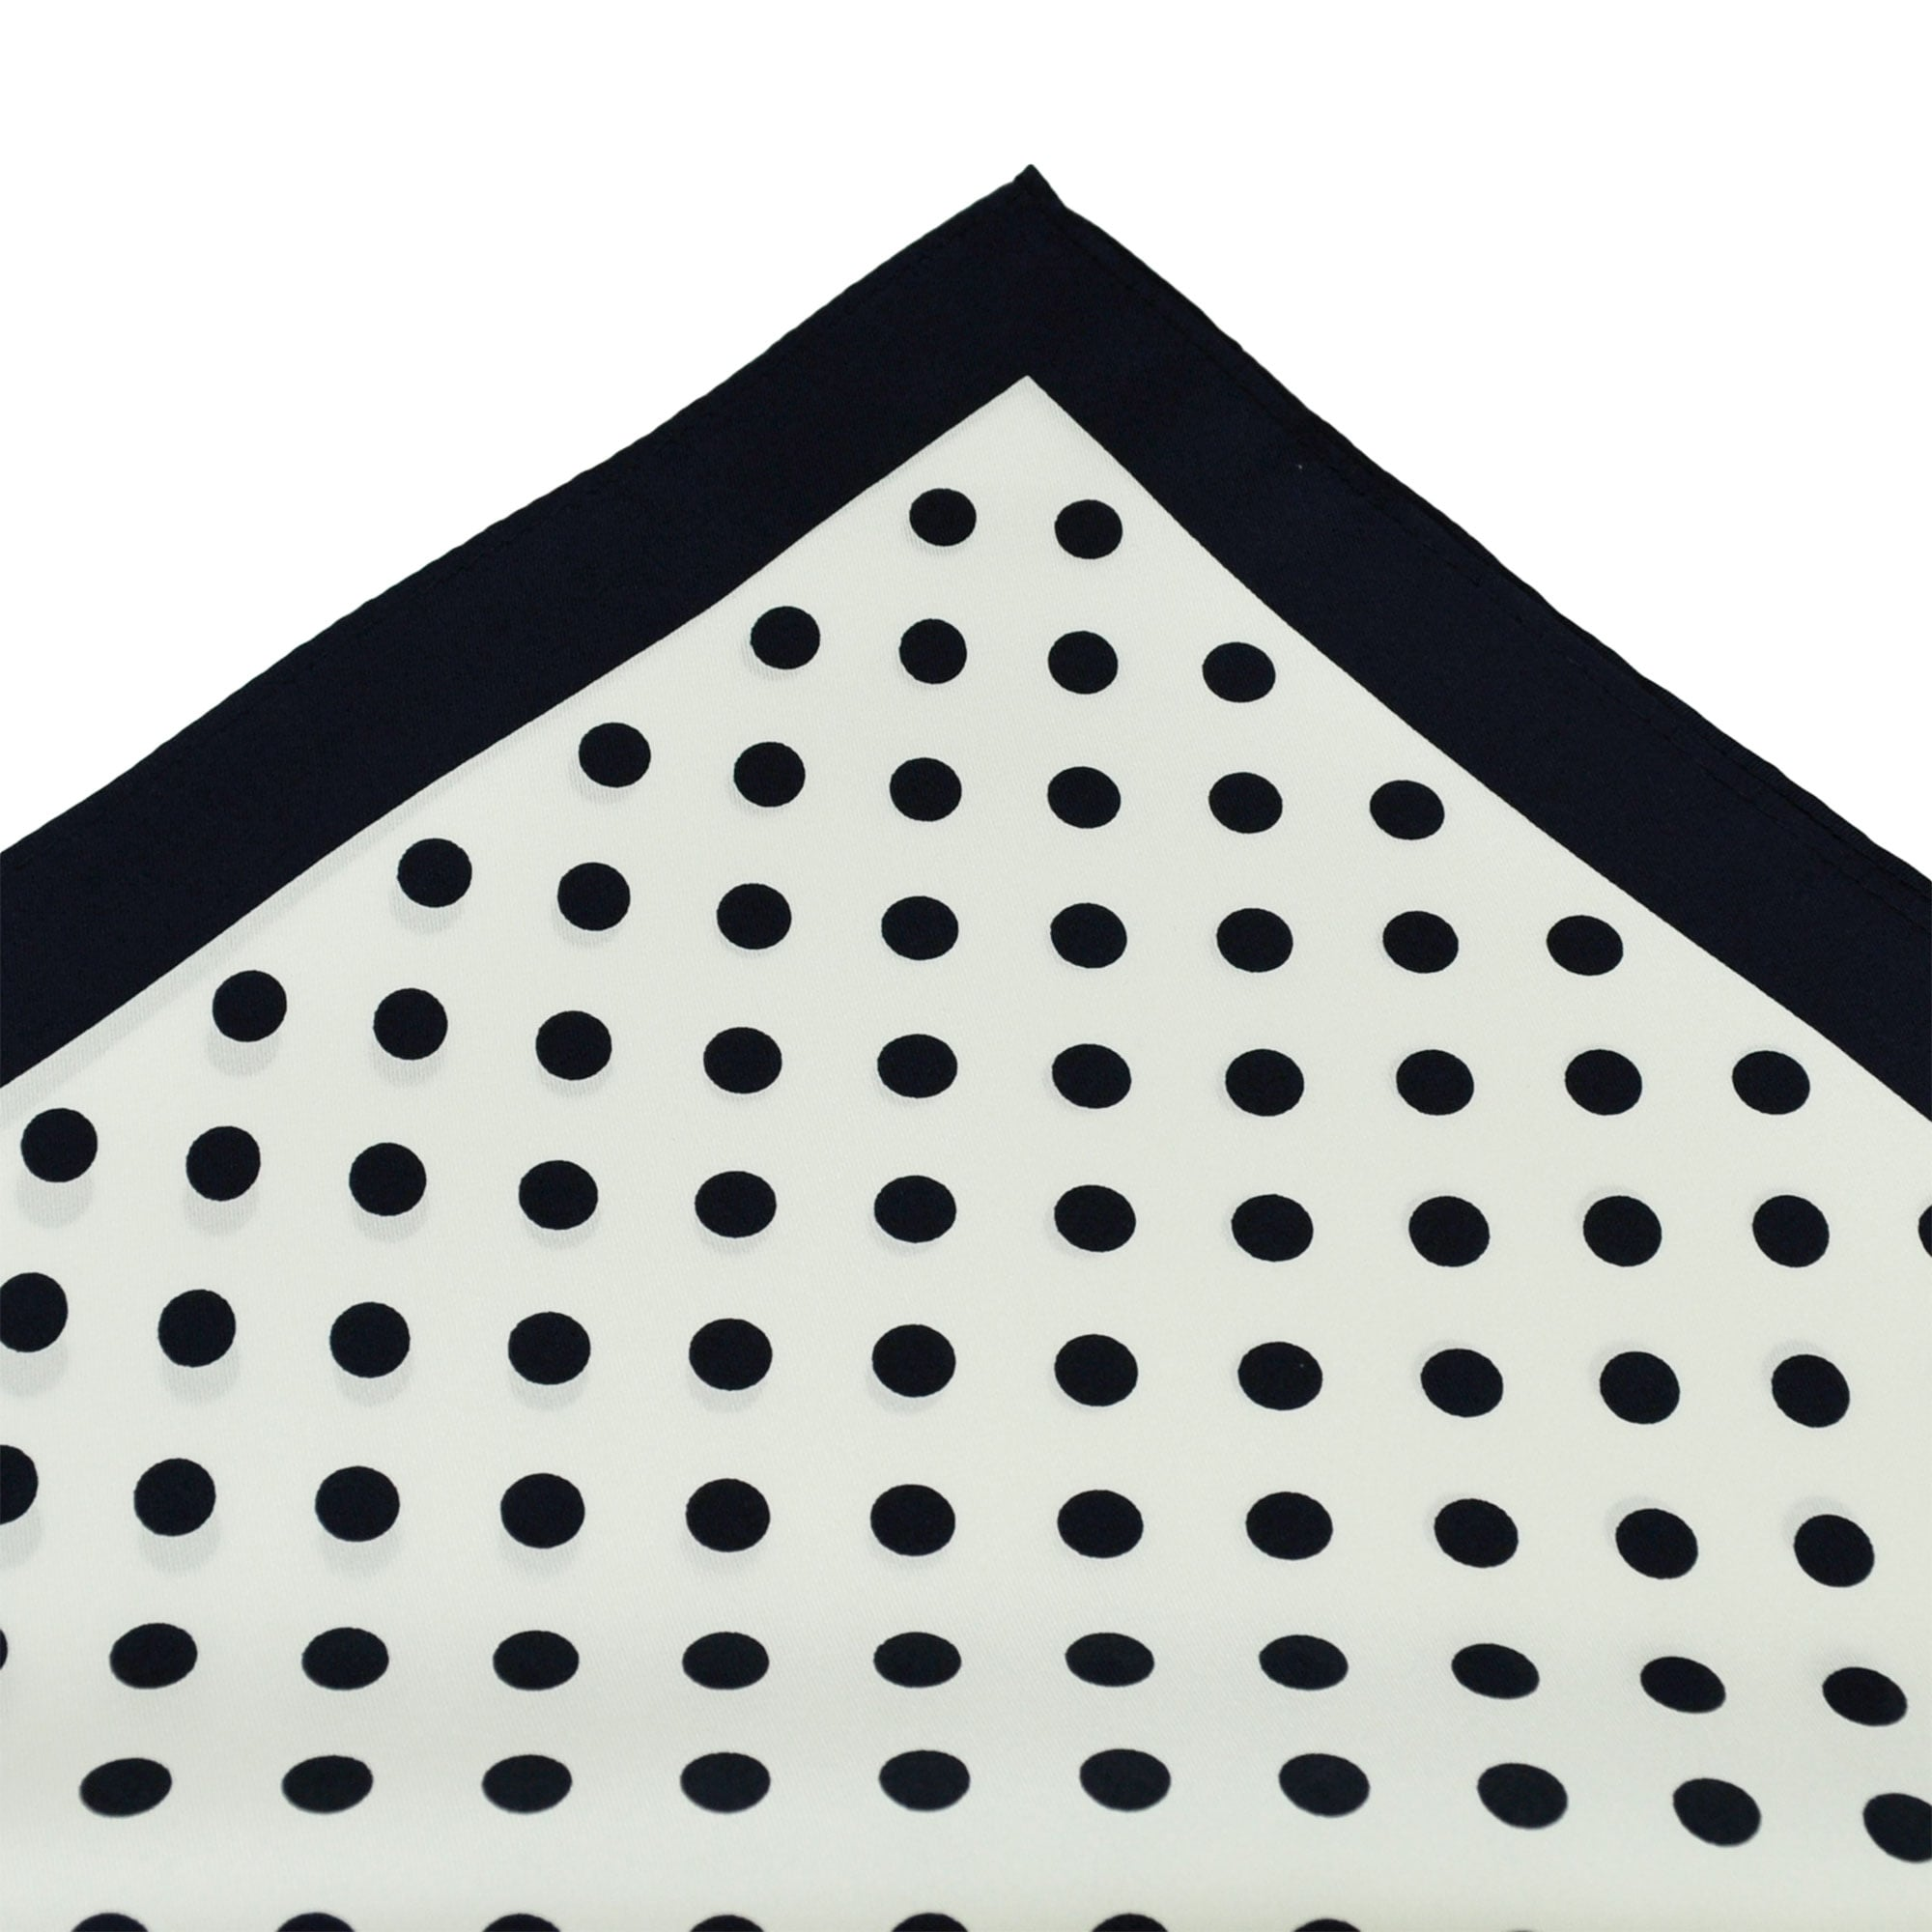 UK Made 100/% SILK Pocket Square Handkerchief Navy Blue Polka Dot DBH-07